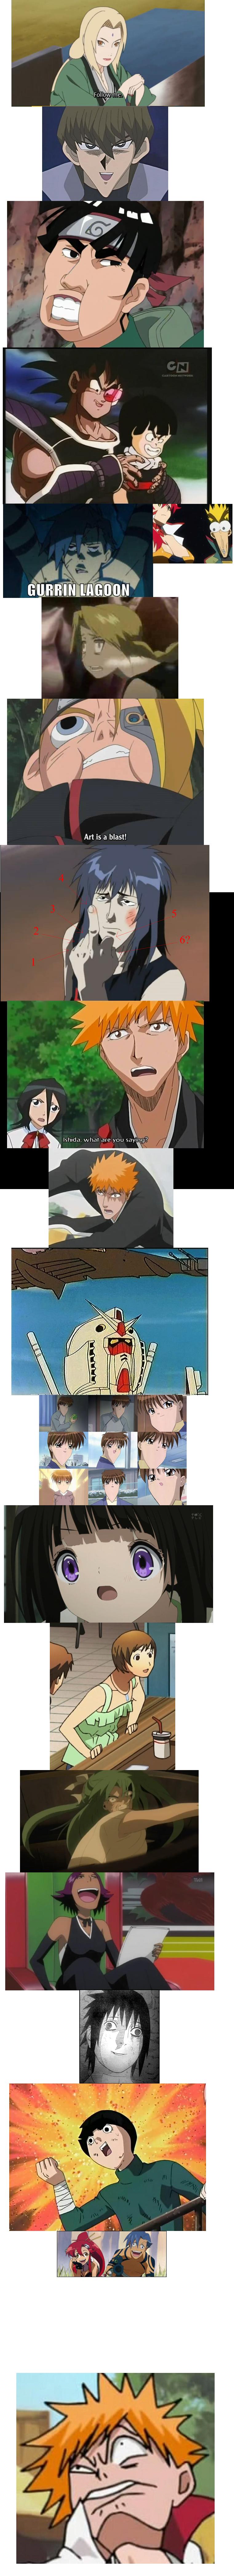 Quality Anime. Hurrr Durrr.. i dont see whats wrong with tsunade Quality Anime Hurrr Durrr i dont see whats wrong with tsunade